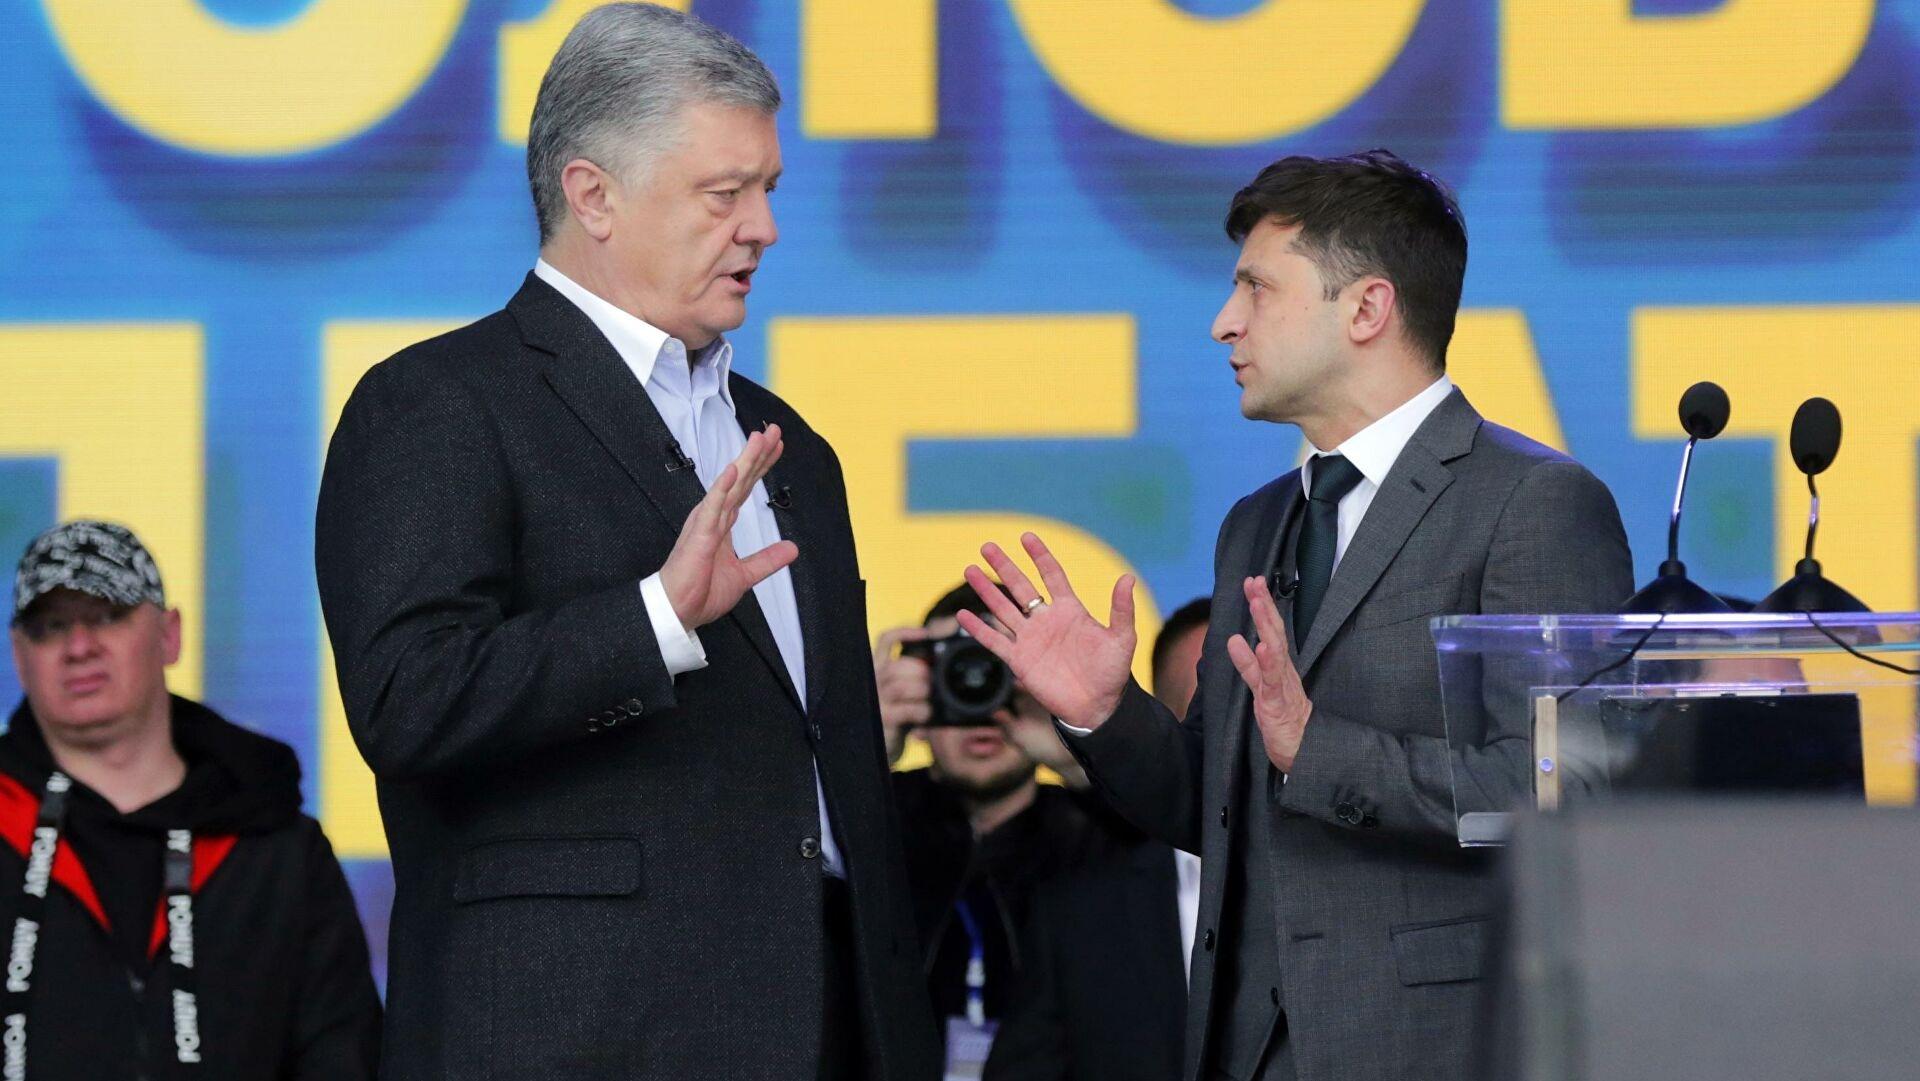 Media: Zelensky, Poroshenko and other Ukrainian politicians continue doing business in Russia